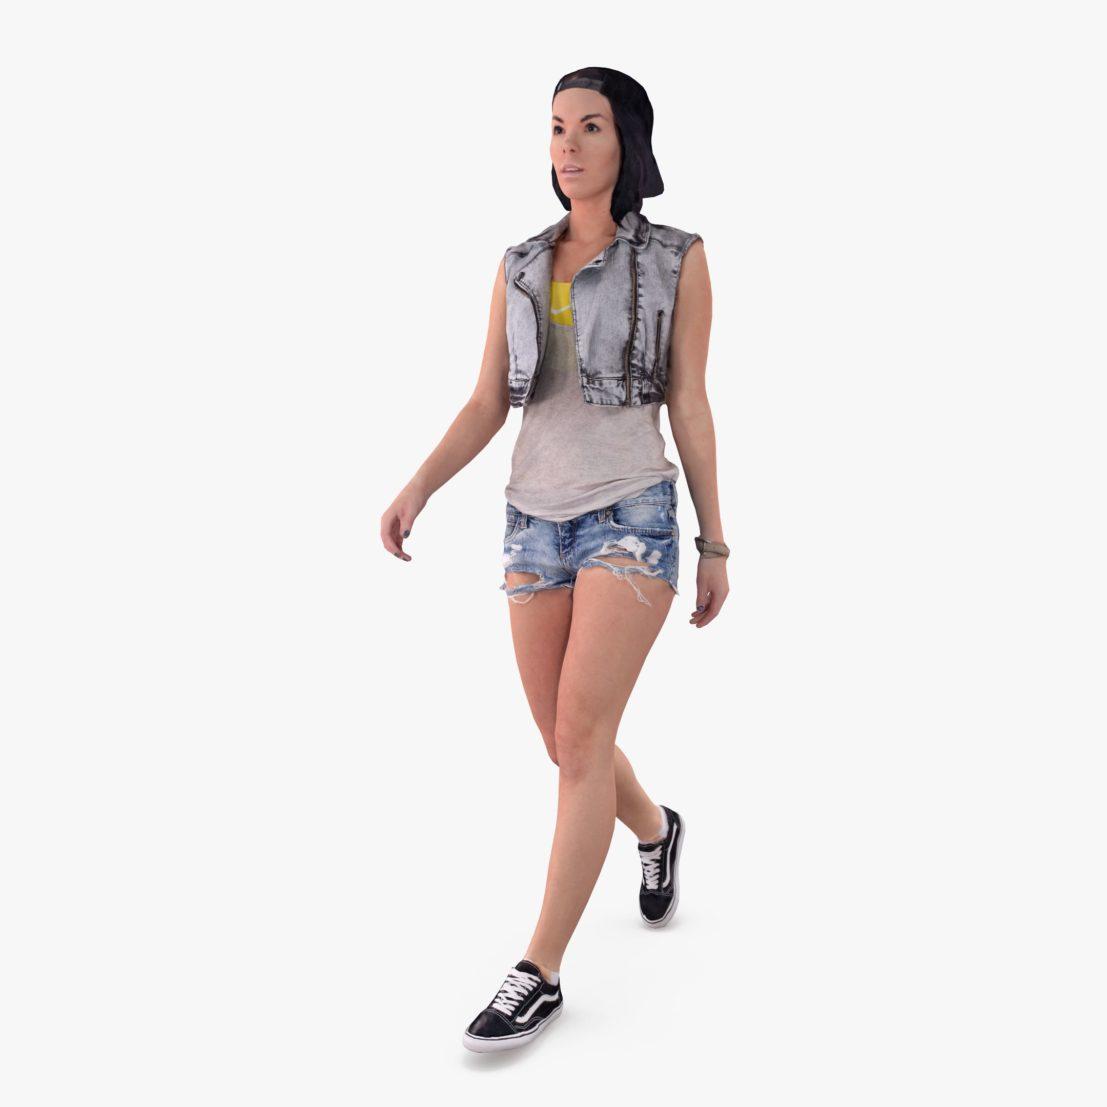 Summer Lady Walking 3D Model   3DTree Scanning Studio